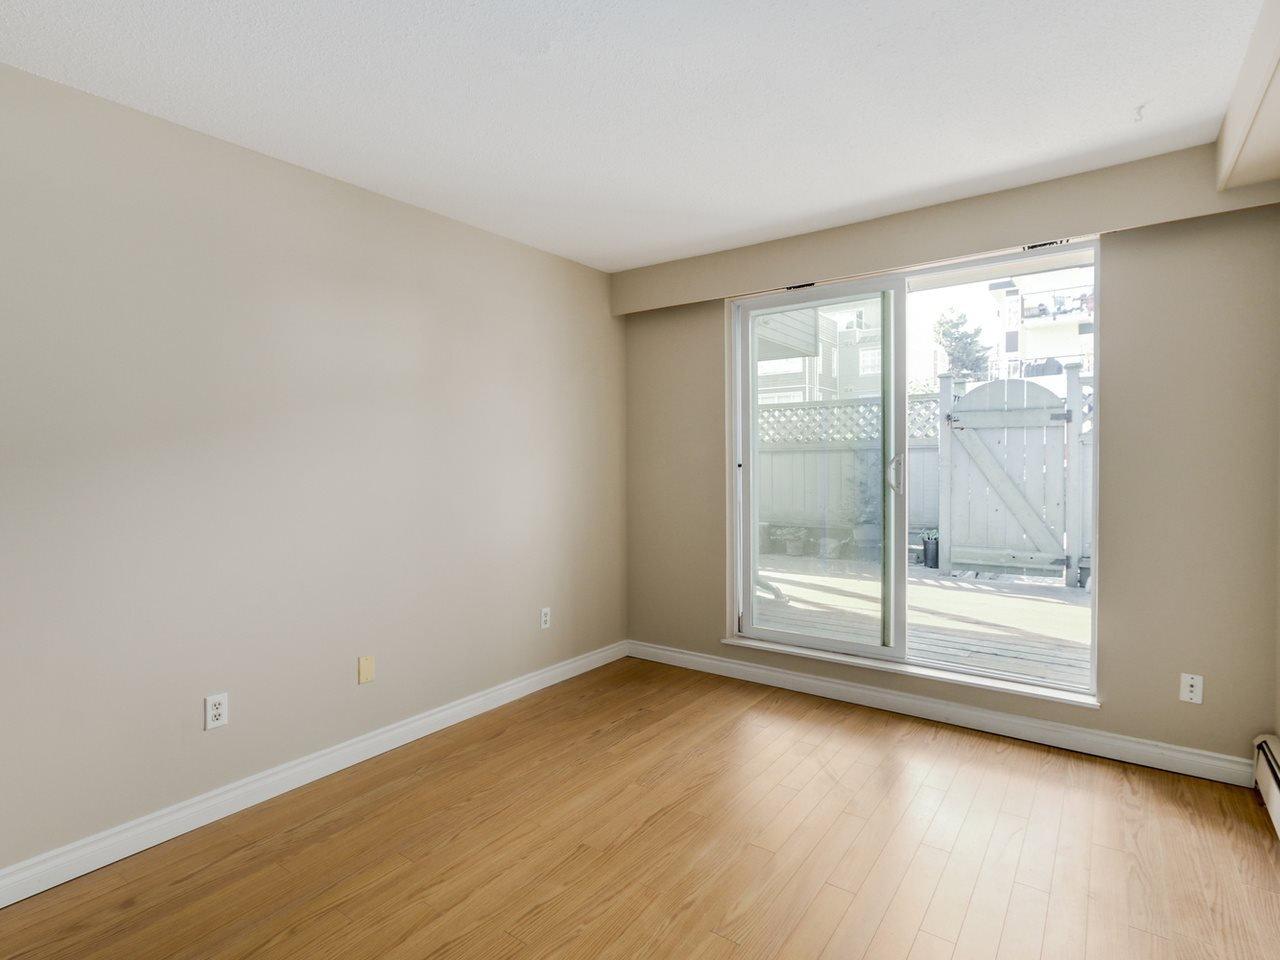 "Photo 12: Photos: 115 2125 YORK Avenue in Vancouver: Kitsilano Condo for sale in ""YORK GARDENS"" (Vancouver West)  : MLS®# R2054686"